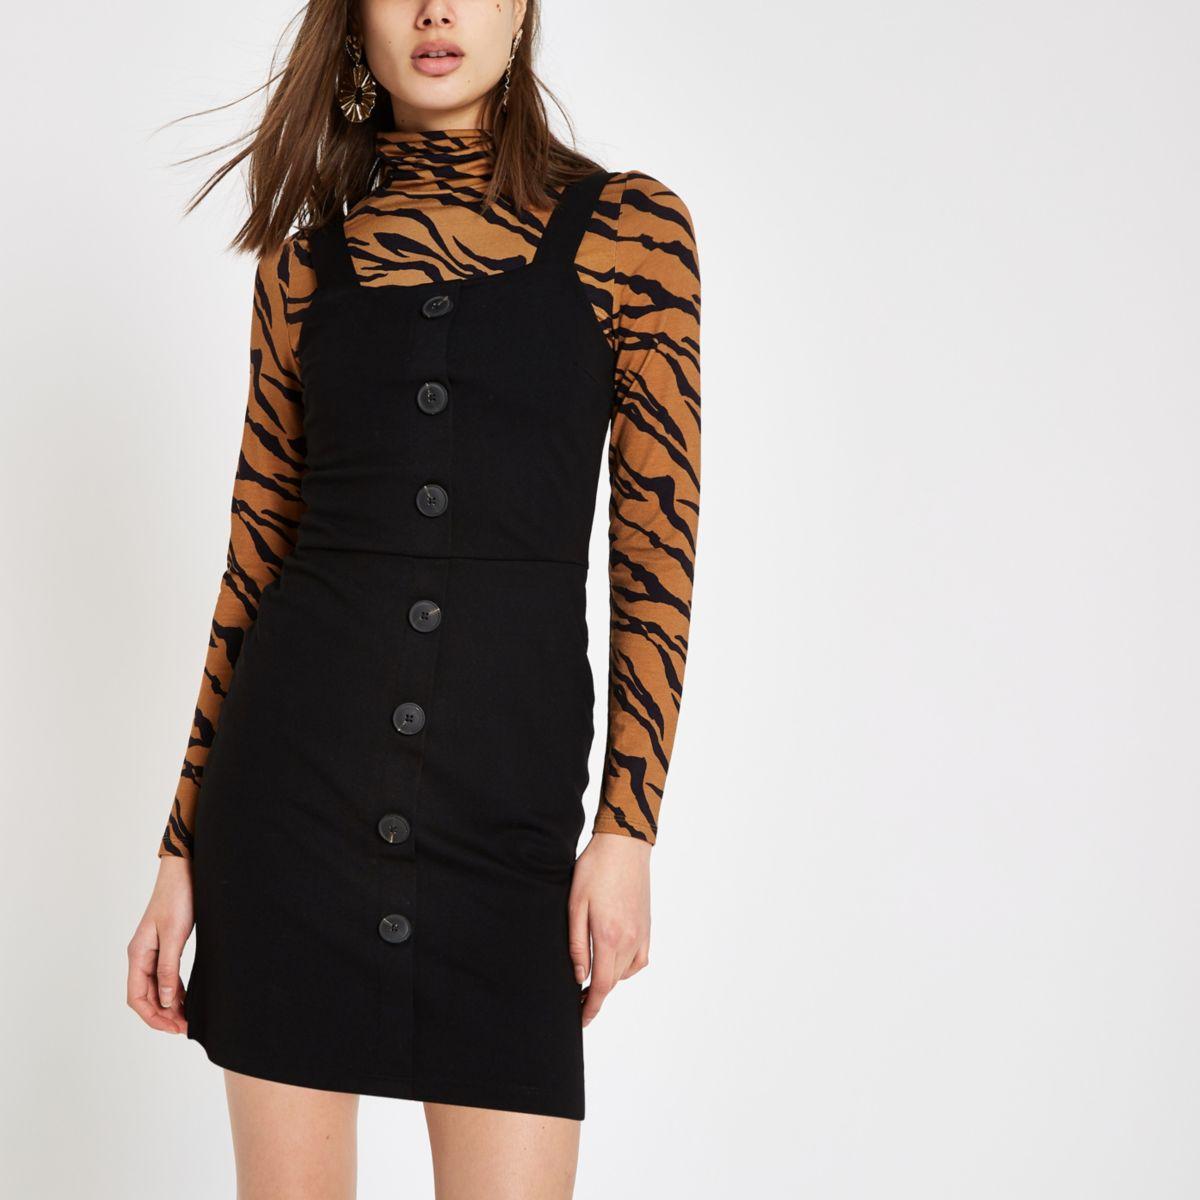 Black bodycon button up mini dress